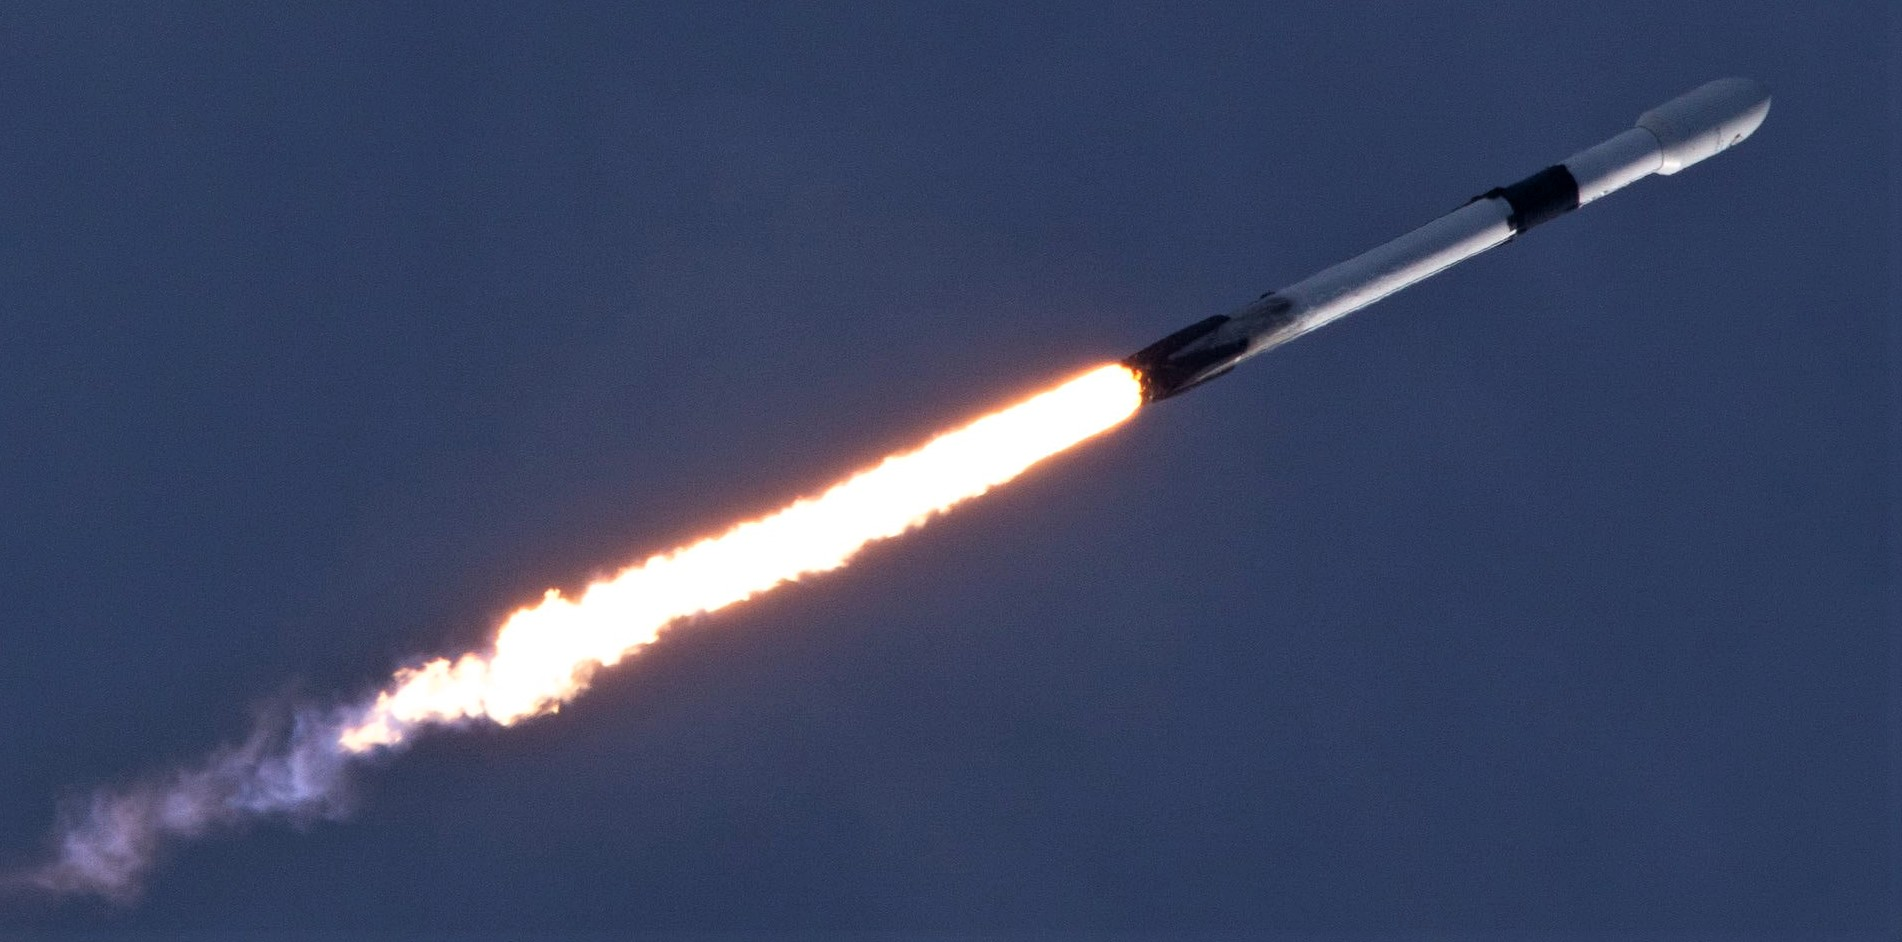 B1047.2 Es'hail 2 launch (Tom Cross) 1